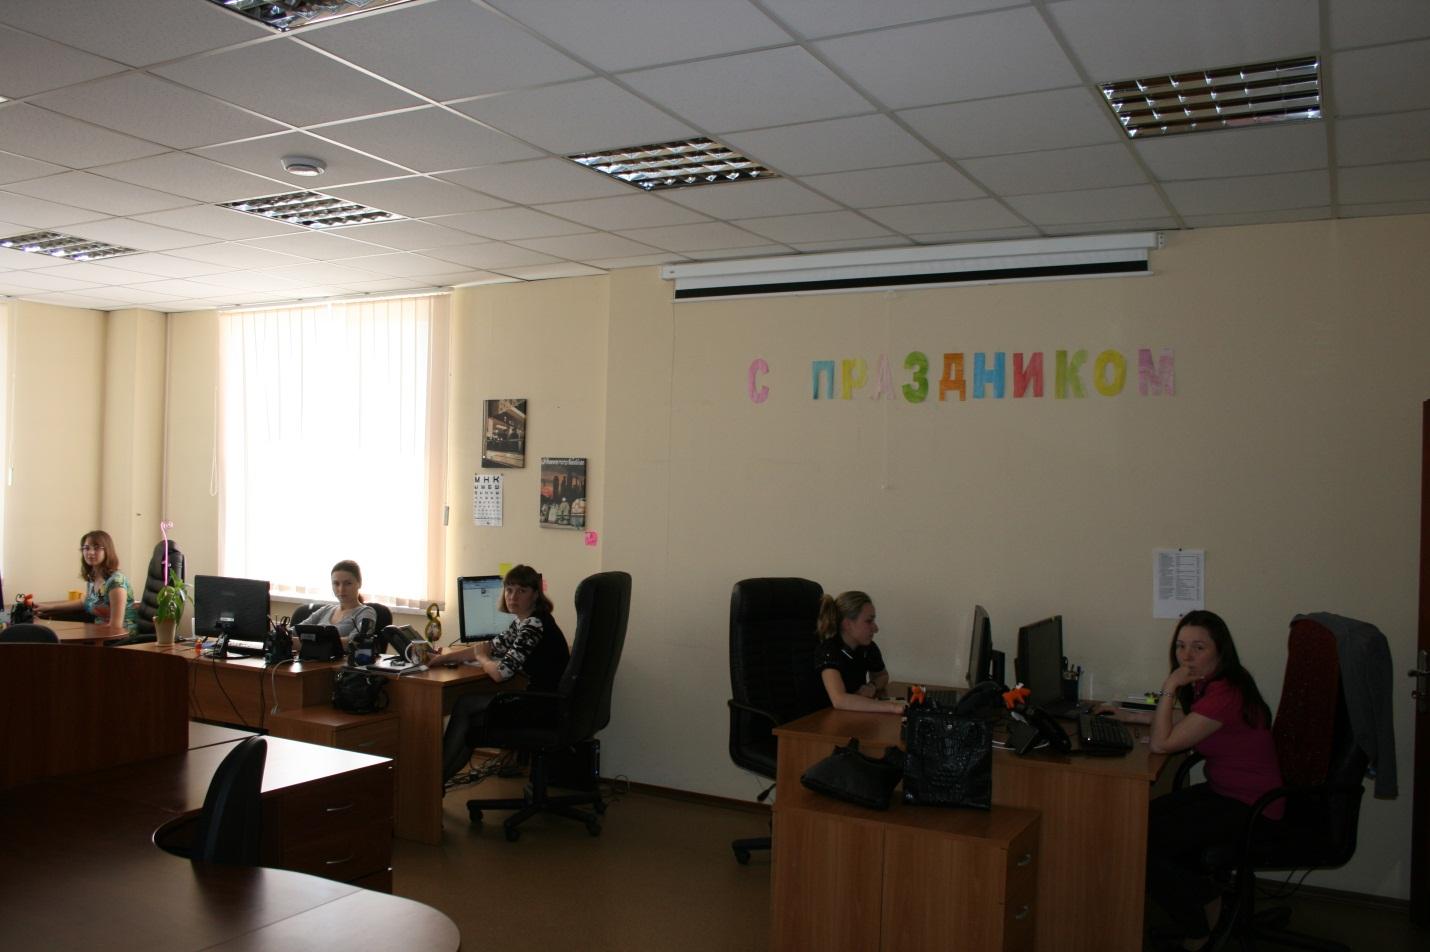 Женский коллектив Яндекса